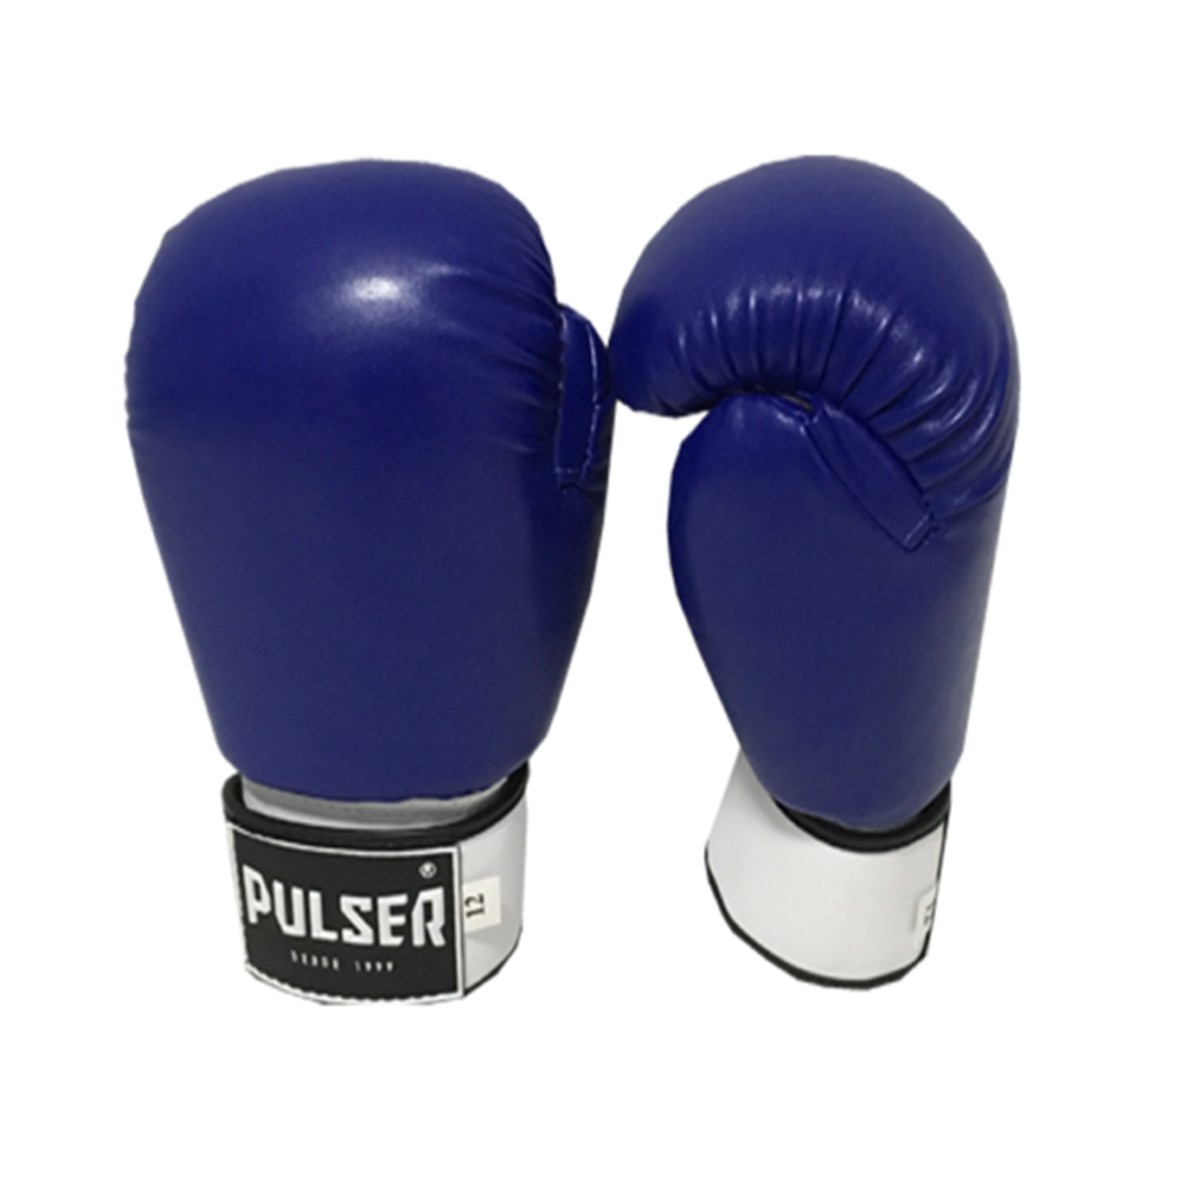 Kit de Muay Thai / Kickboxing 14oz - Azul - Pulser  - PRALUTA SHOP